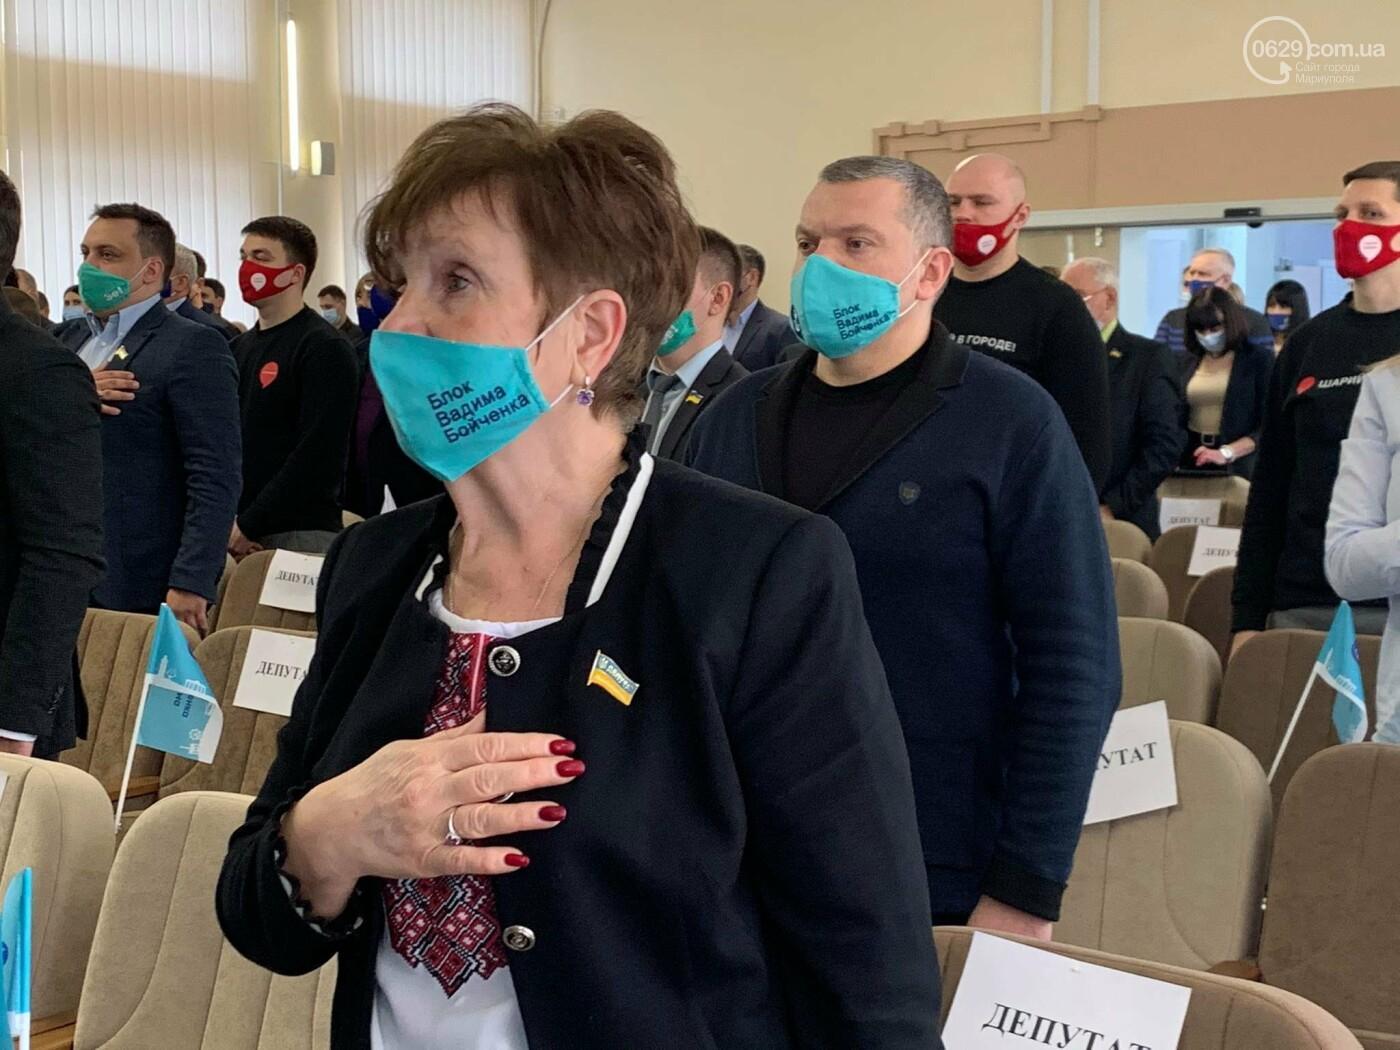 В Мариуполе стартовала сессия горсовета: работники СРЗ устроили митинг, - ФОТО, фото-2